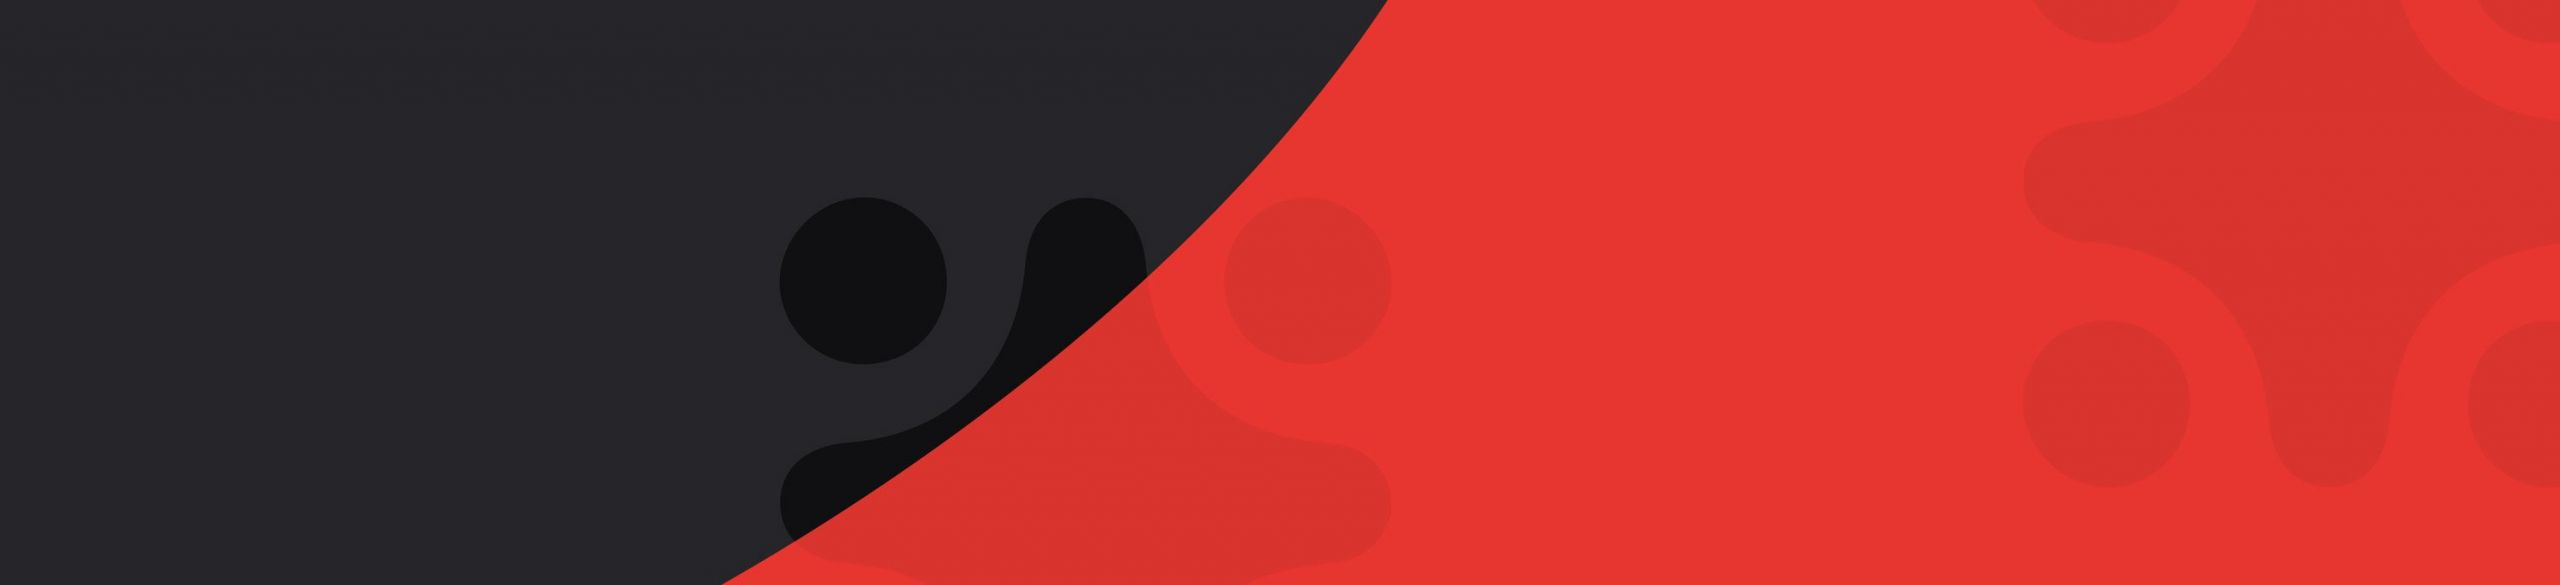 product-slice-background